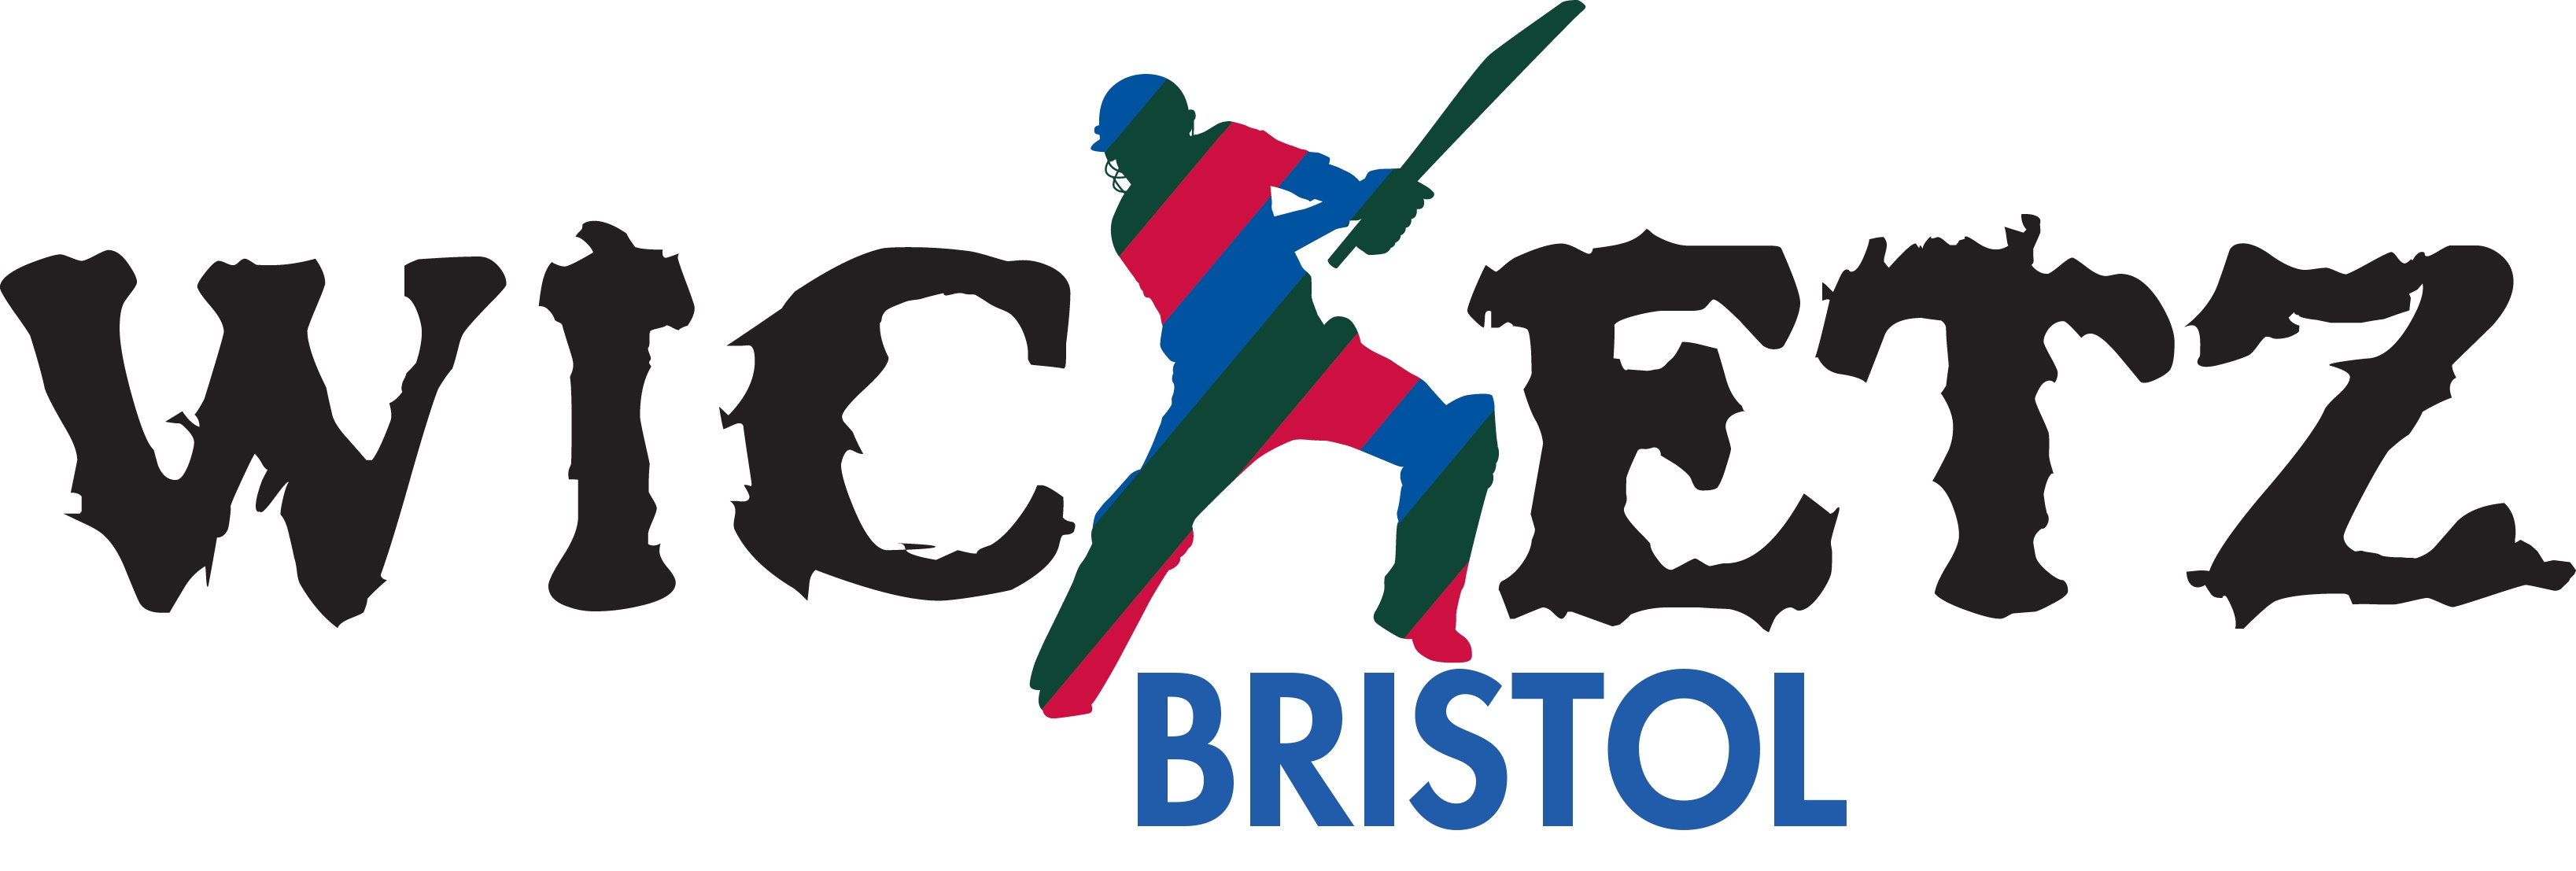 Wicketz_RGB_Bristol